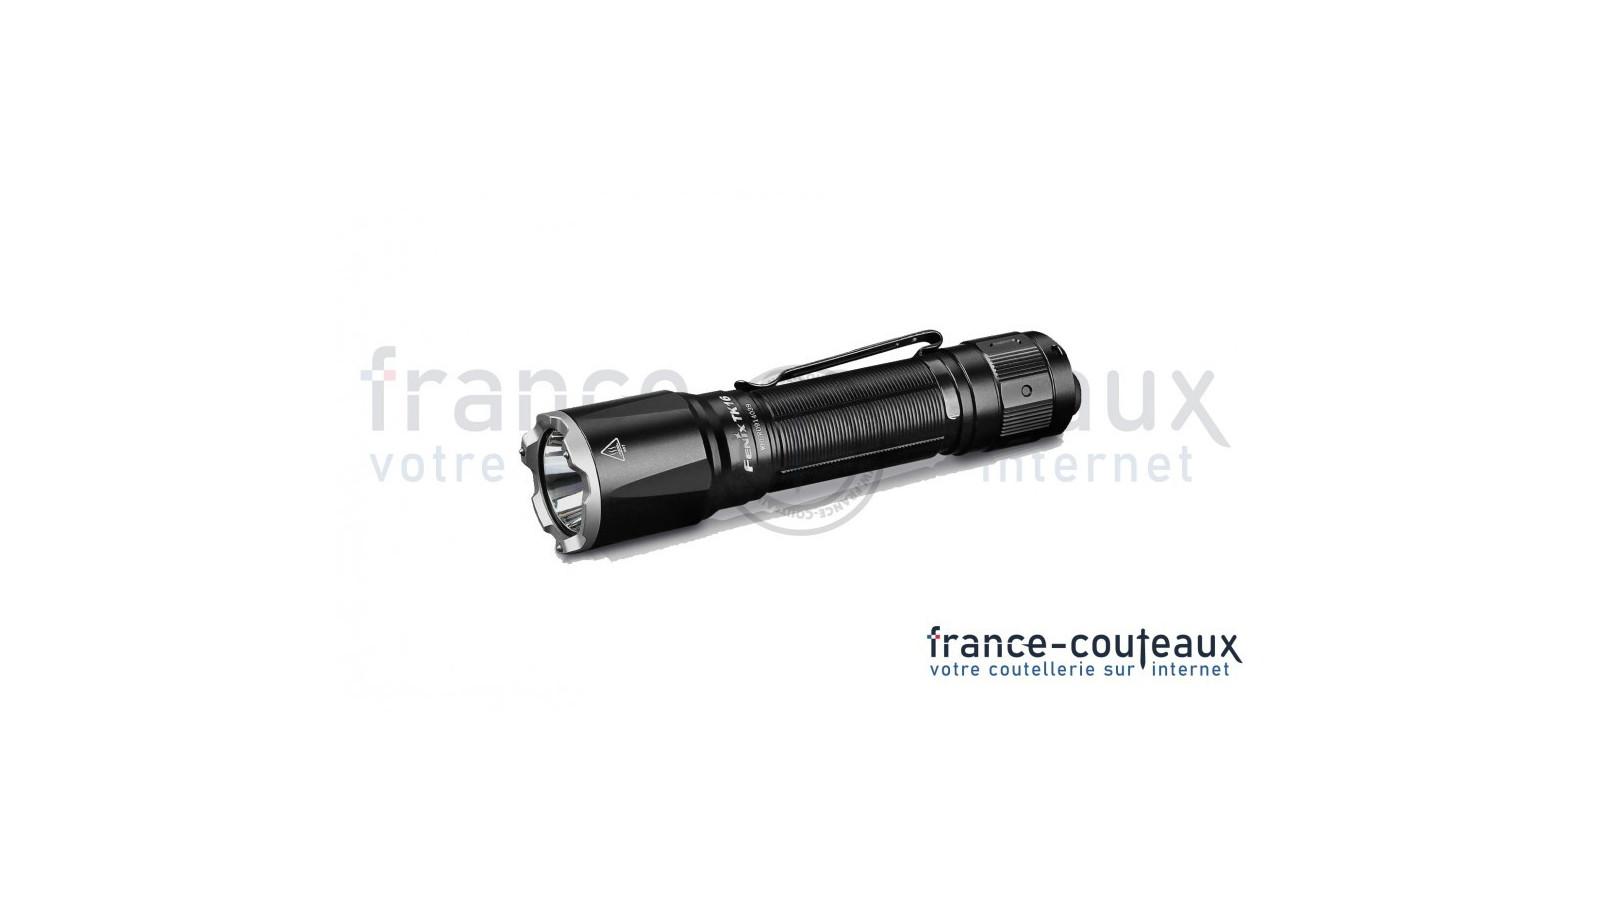 Tomahawk hache noire United Cutlery M48 Tactical Rainbow - 40 cm